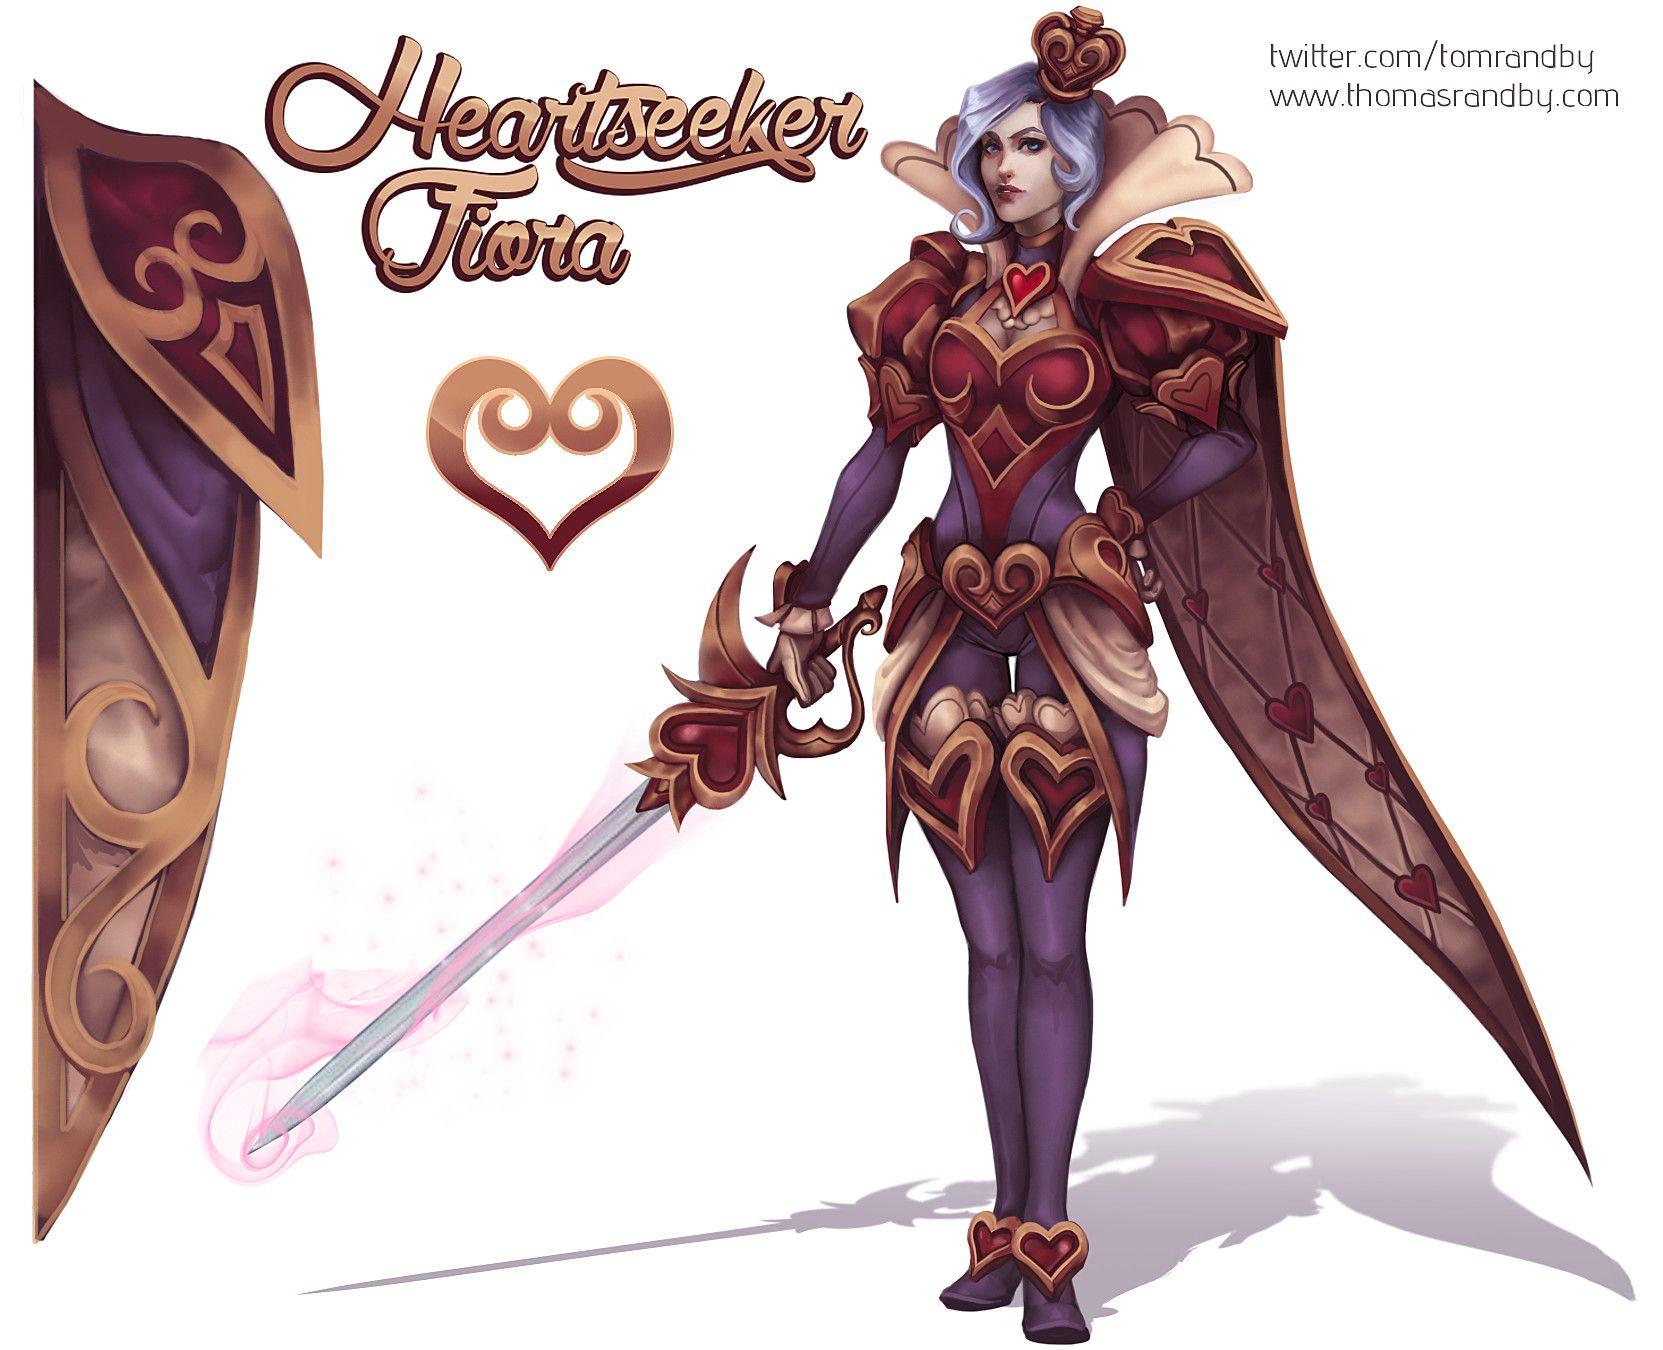 ArtStation - Heartseeker Fiora, Thomas Randby